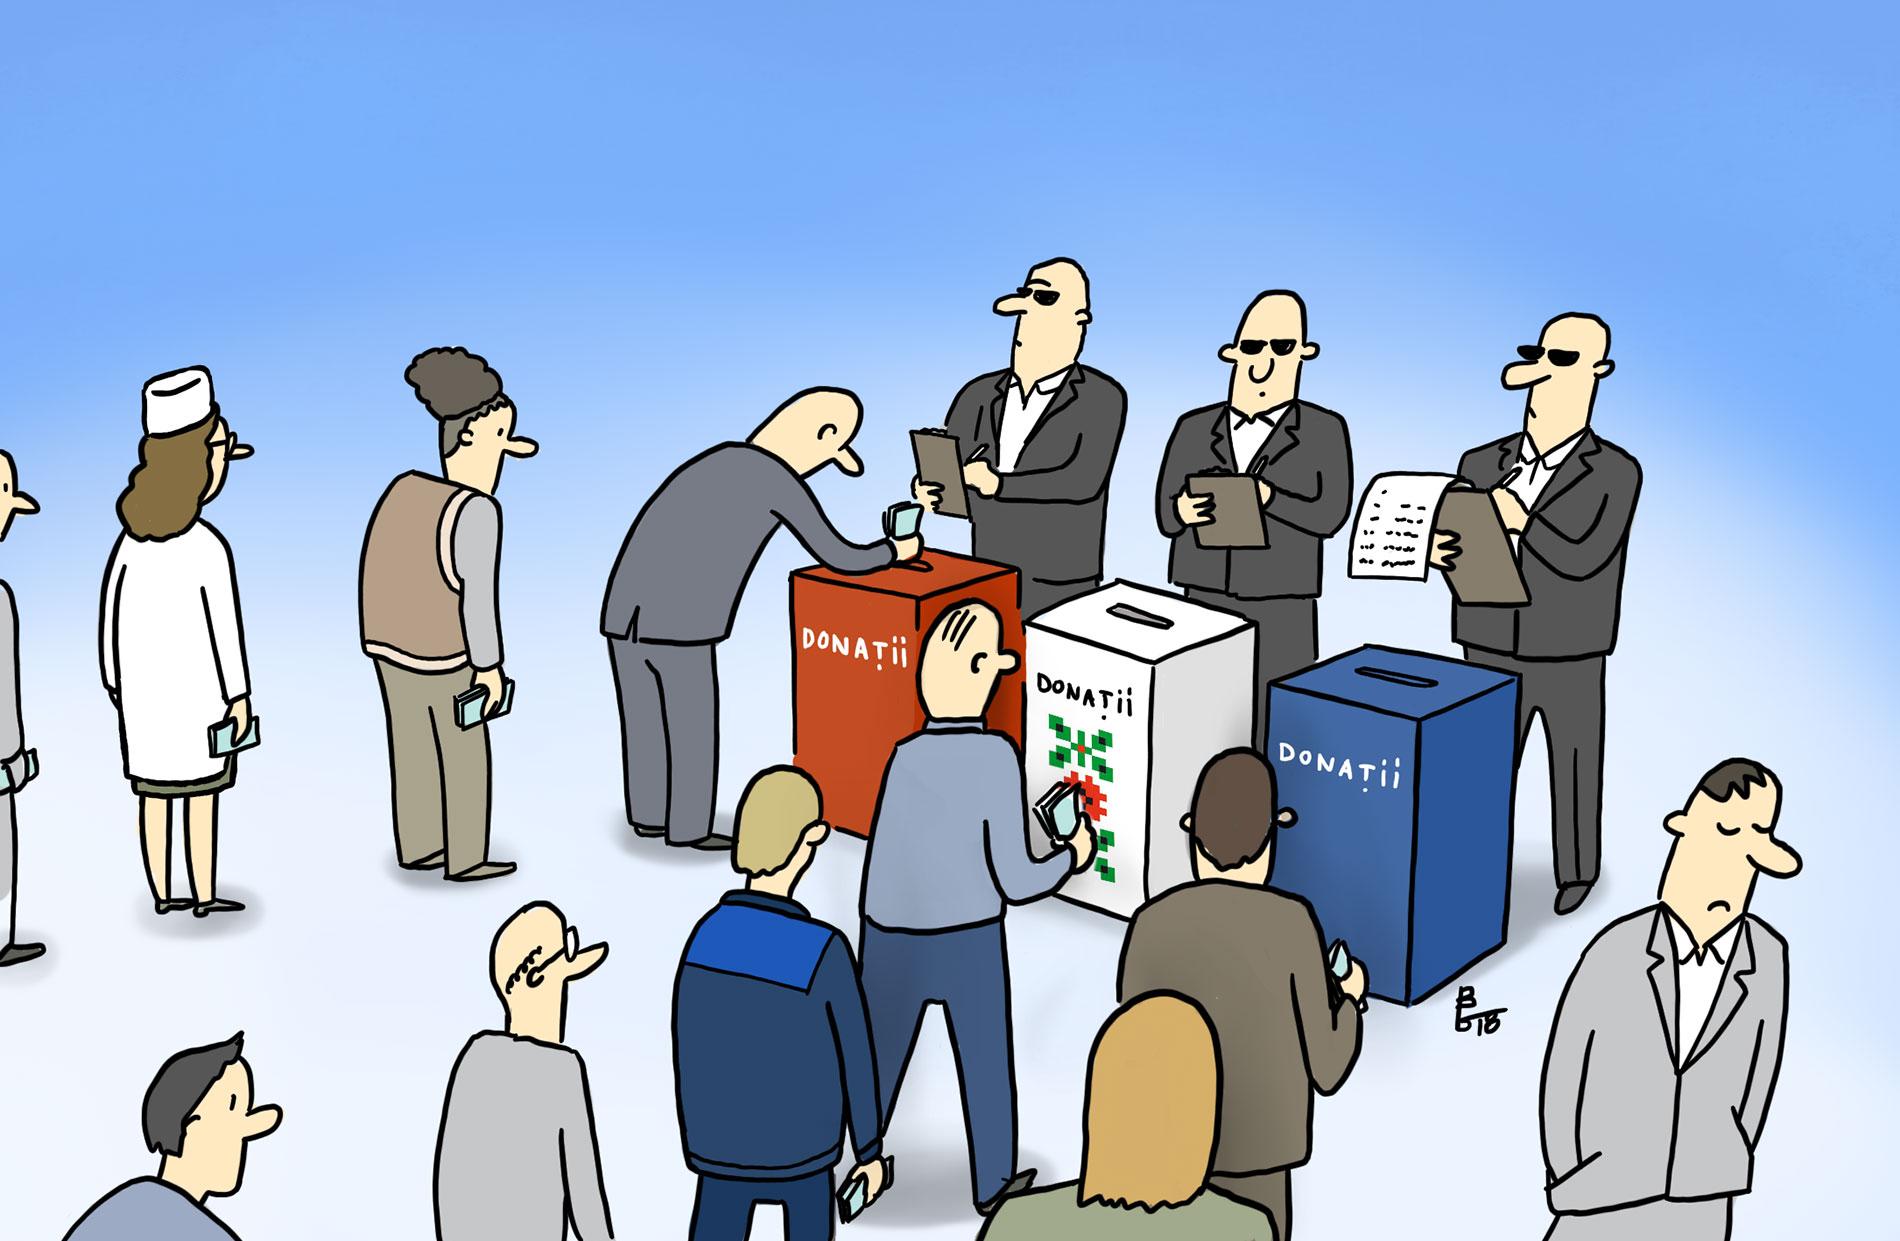 donatii-caricatura-1